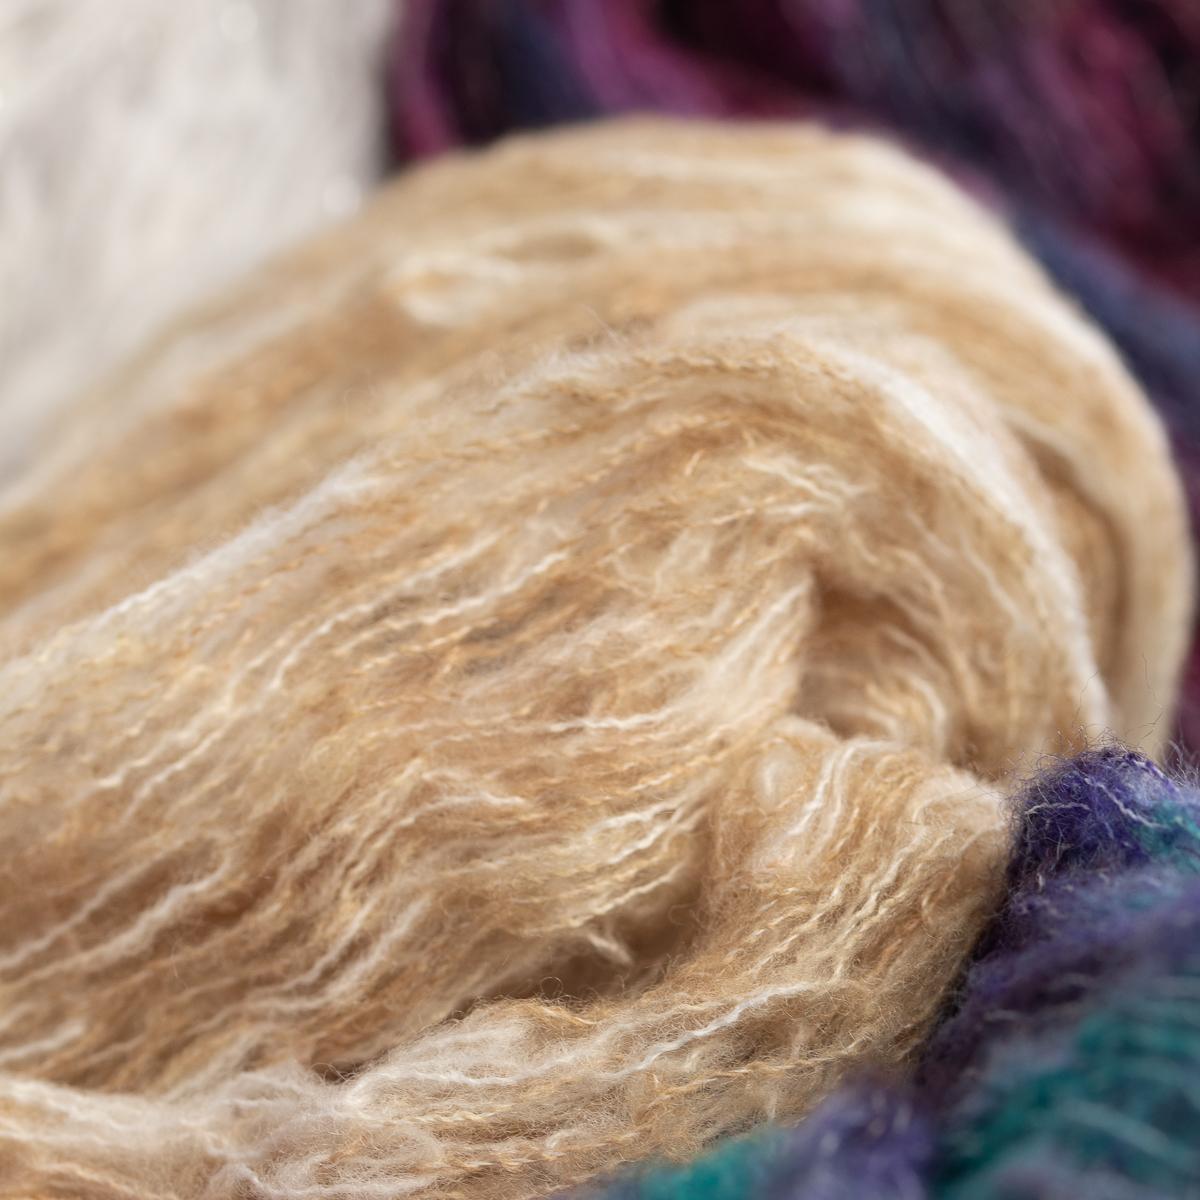 thumbnail 20 - 3pk-Lion-Brand-Imagine-Acrylic-Blend-Yarn-Super-Bulky-6-Knitting-Crochet-Soft